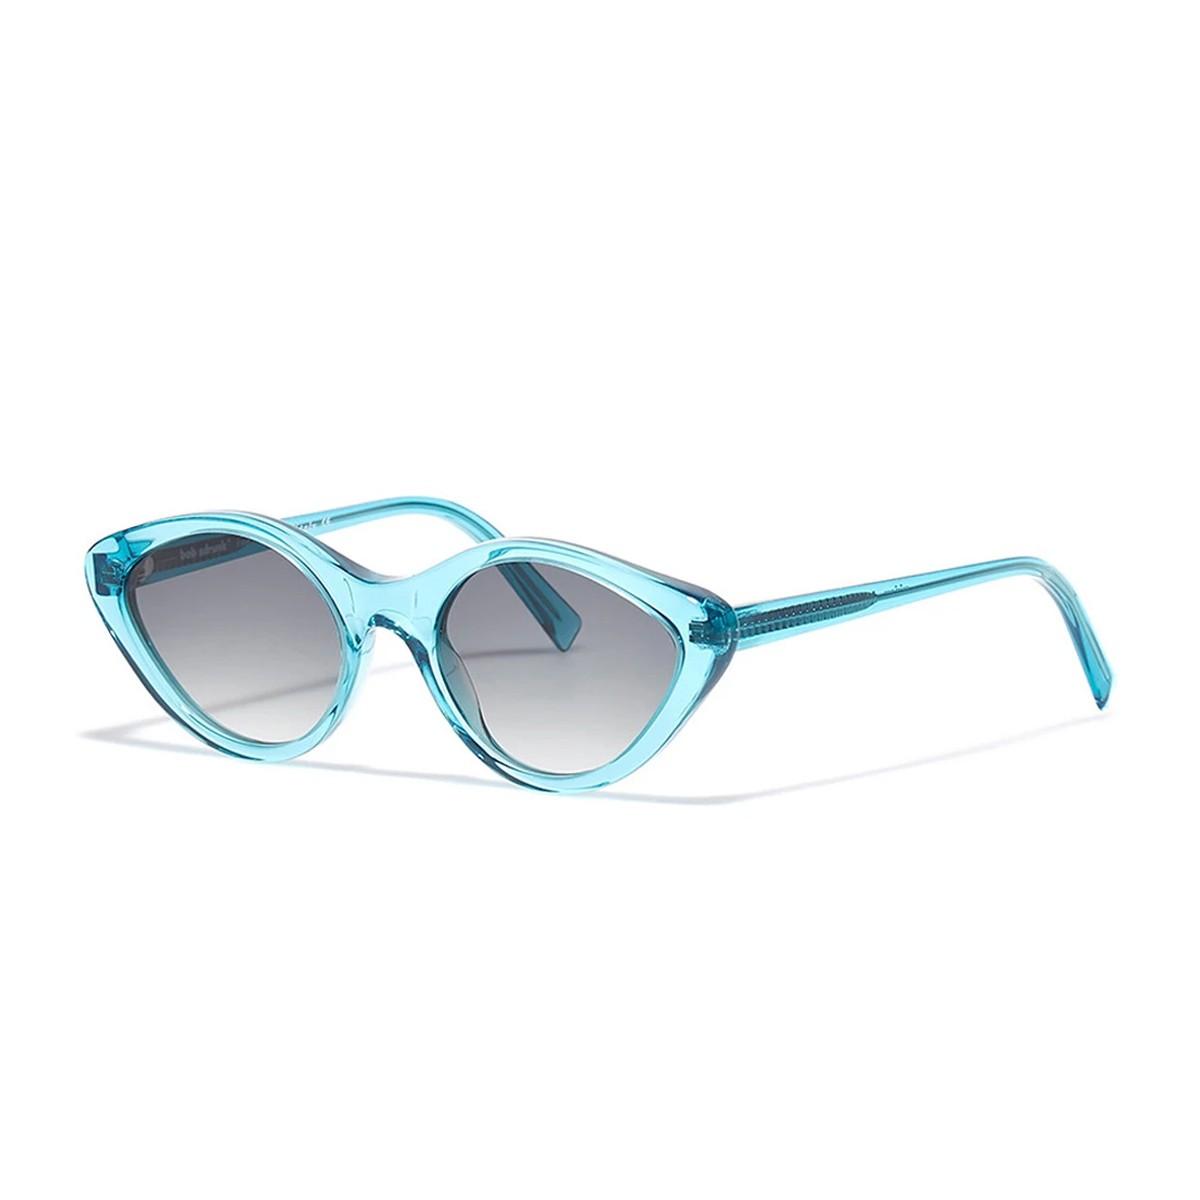 Bob Sdrunk Miriam | Women's sunglasses